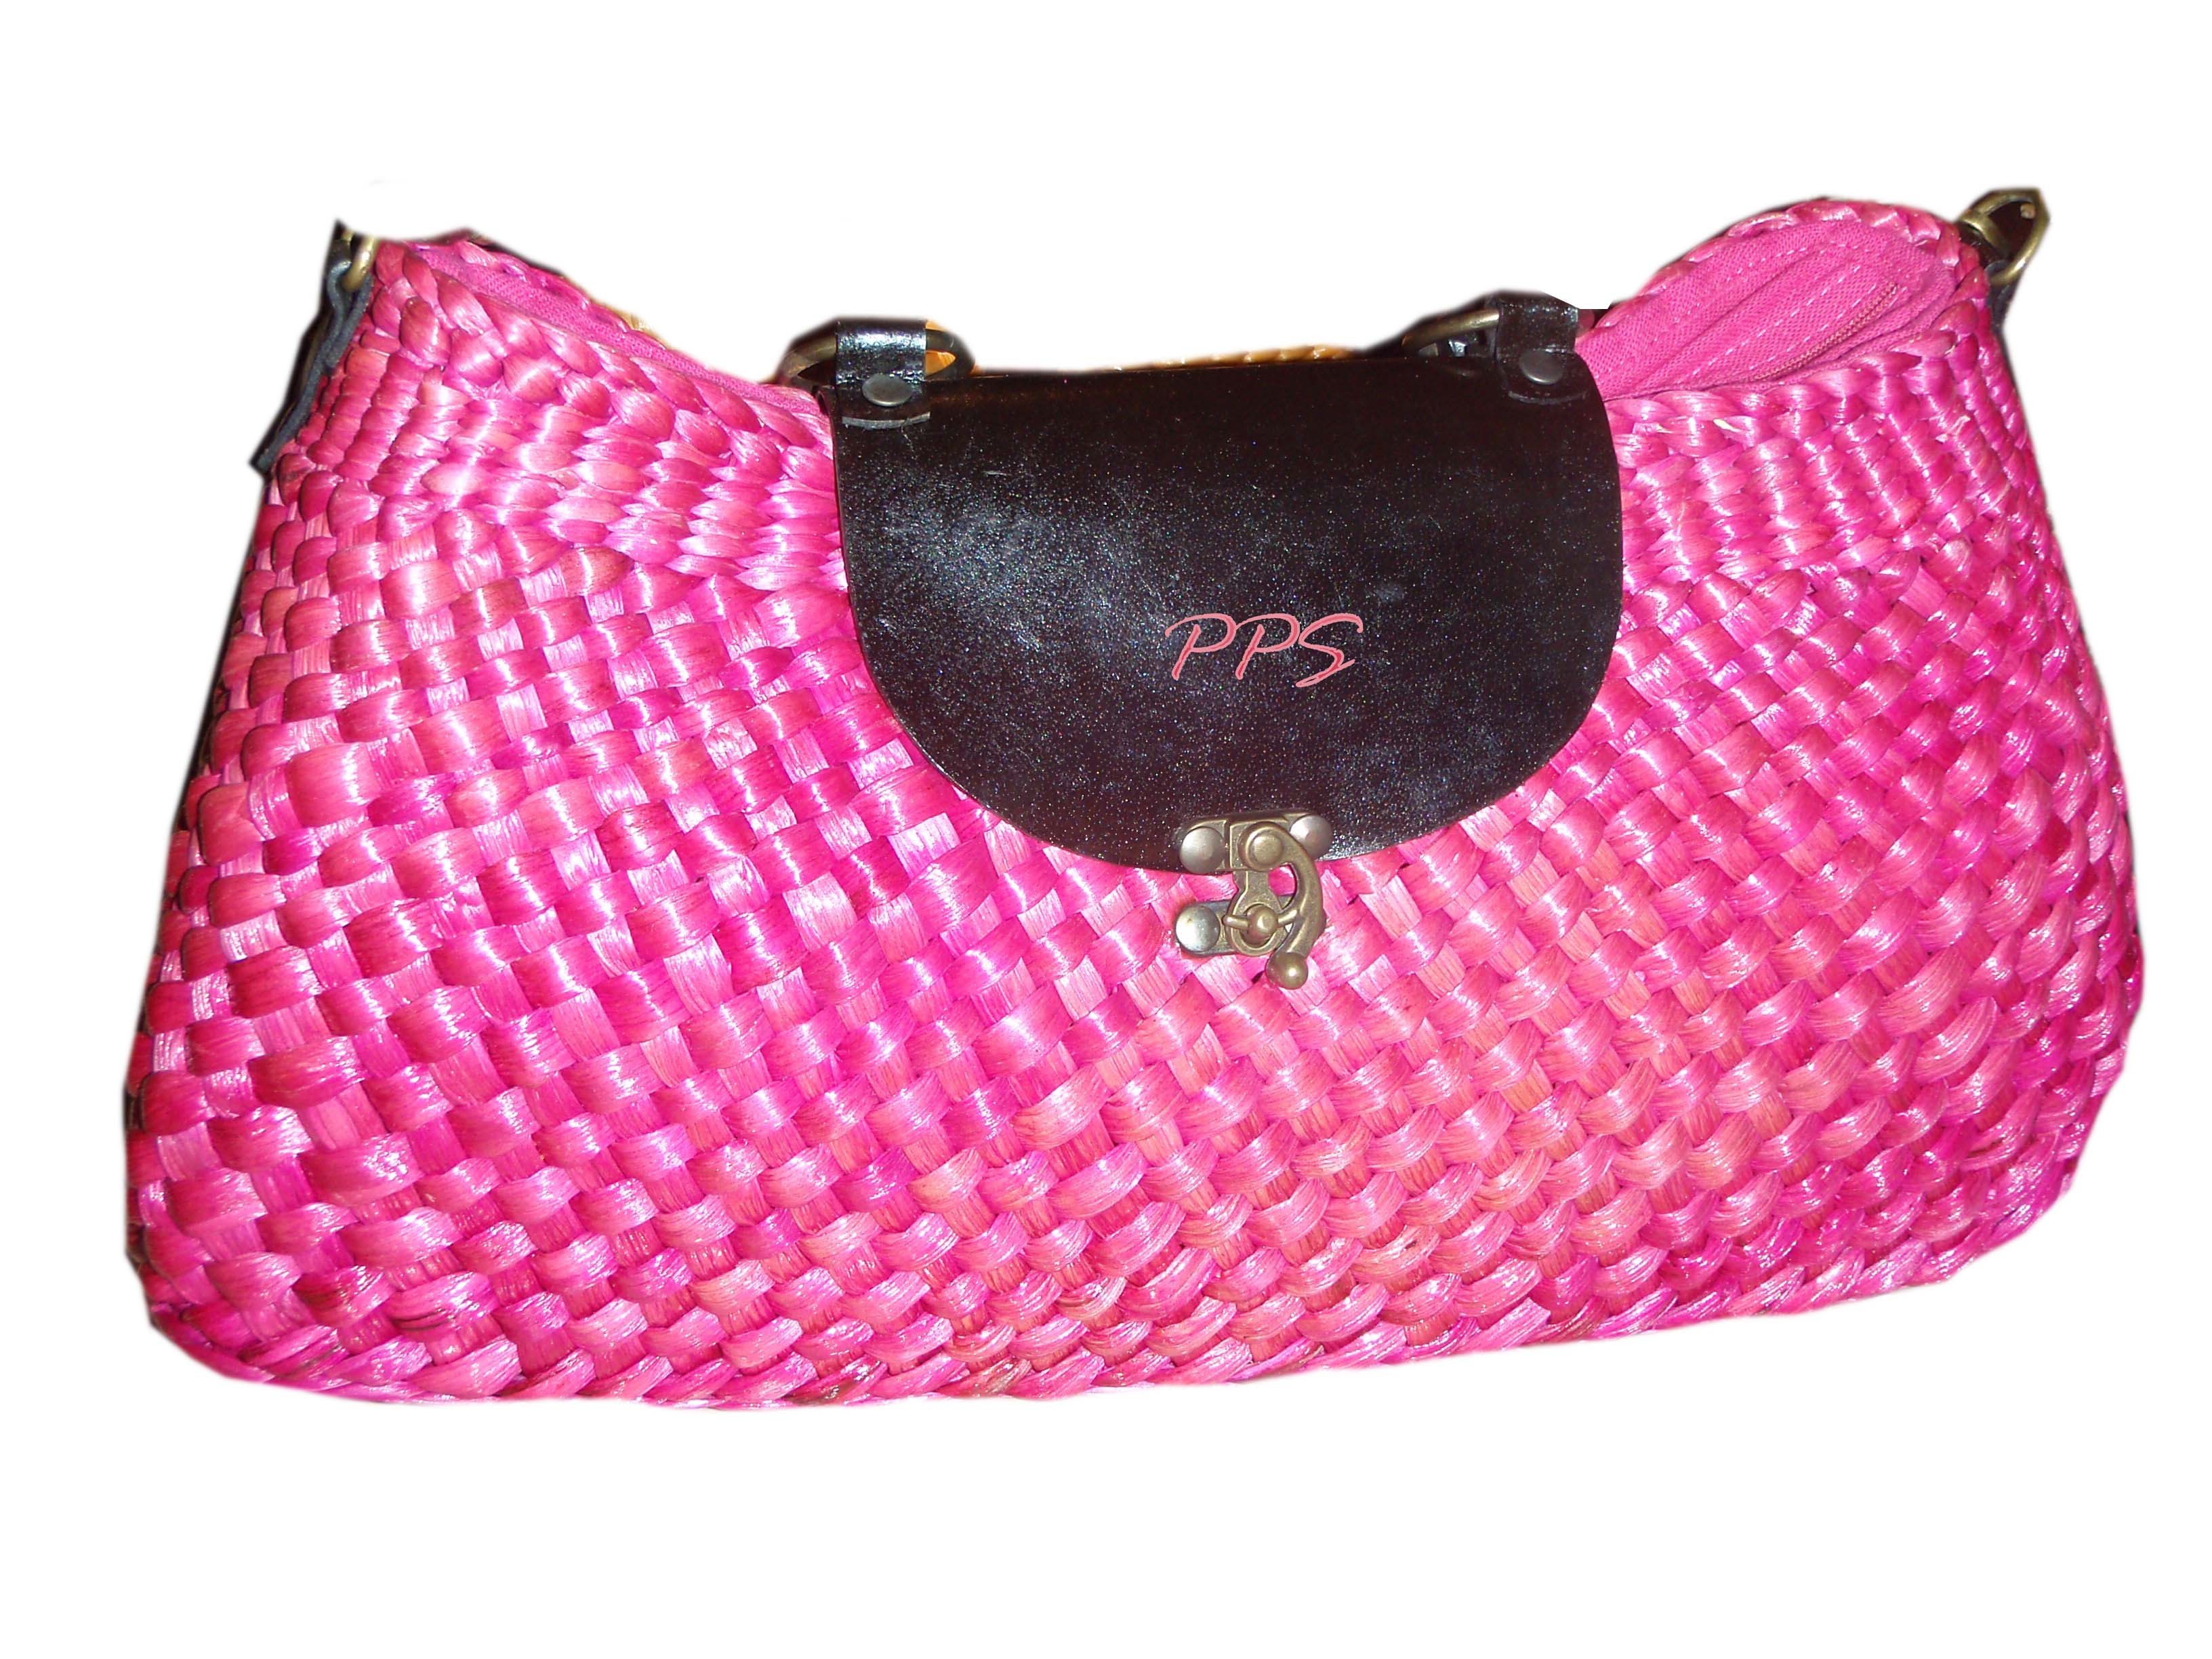 Hyacinth Banth Bag-PPS Bag brand 29